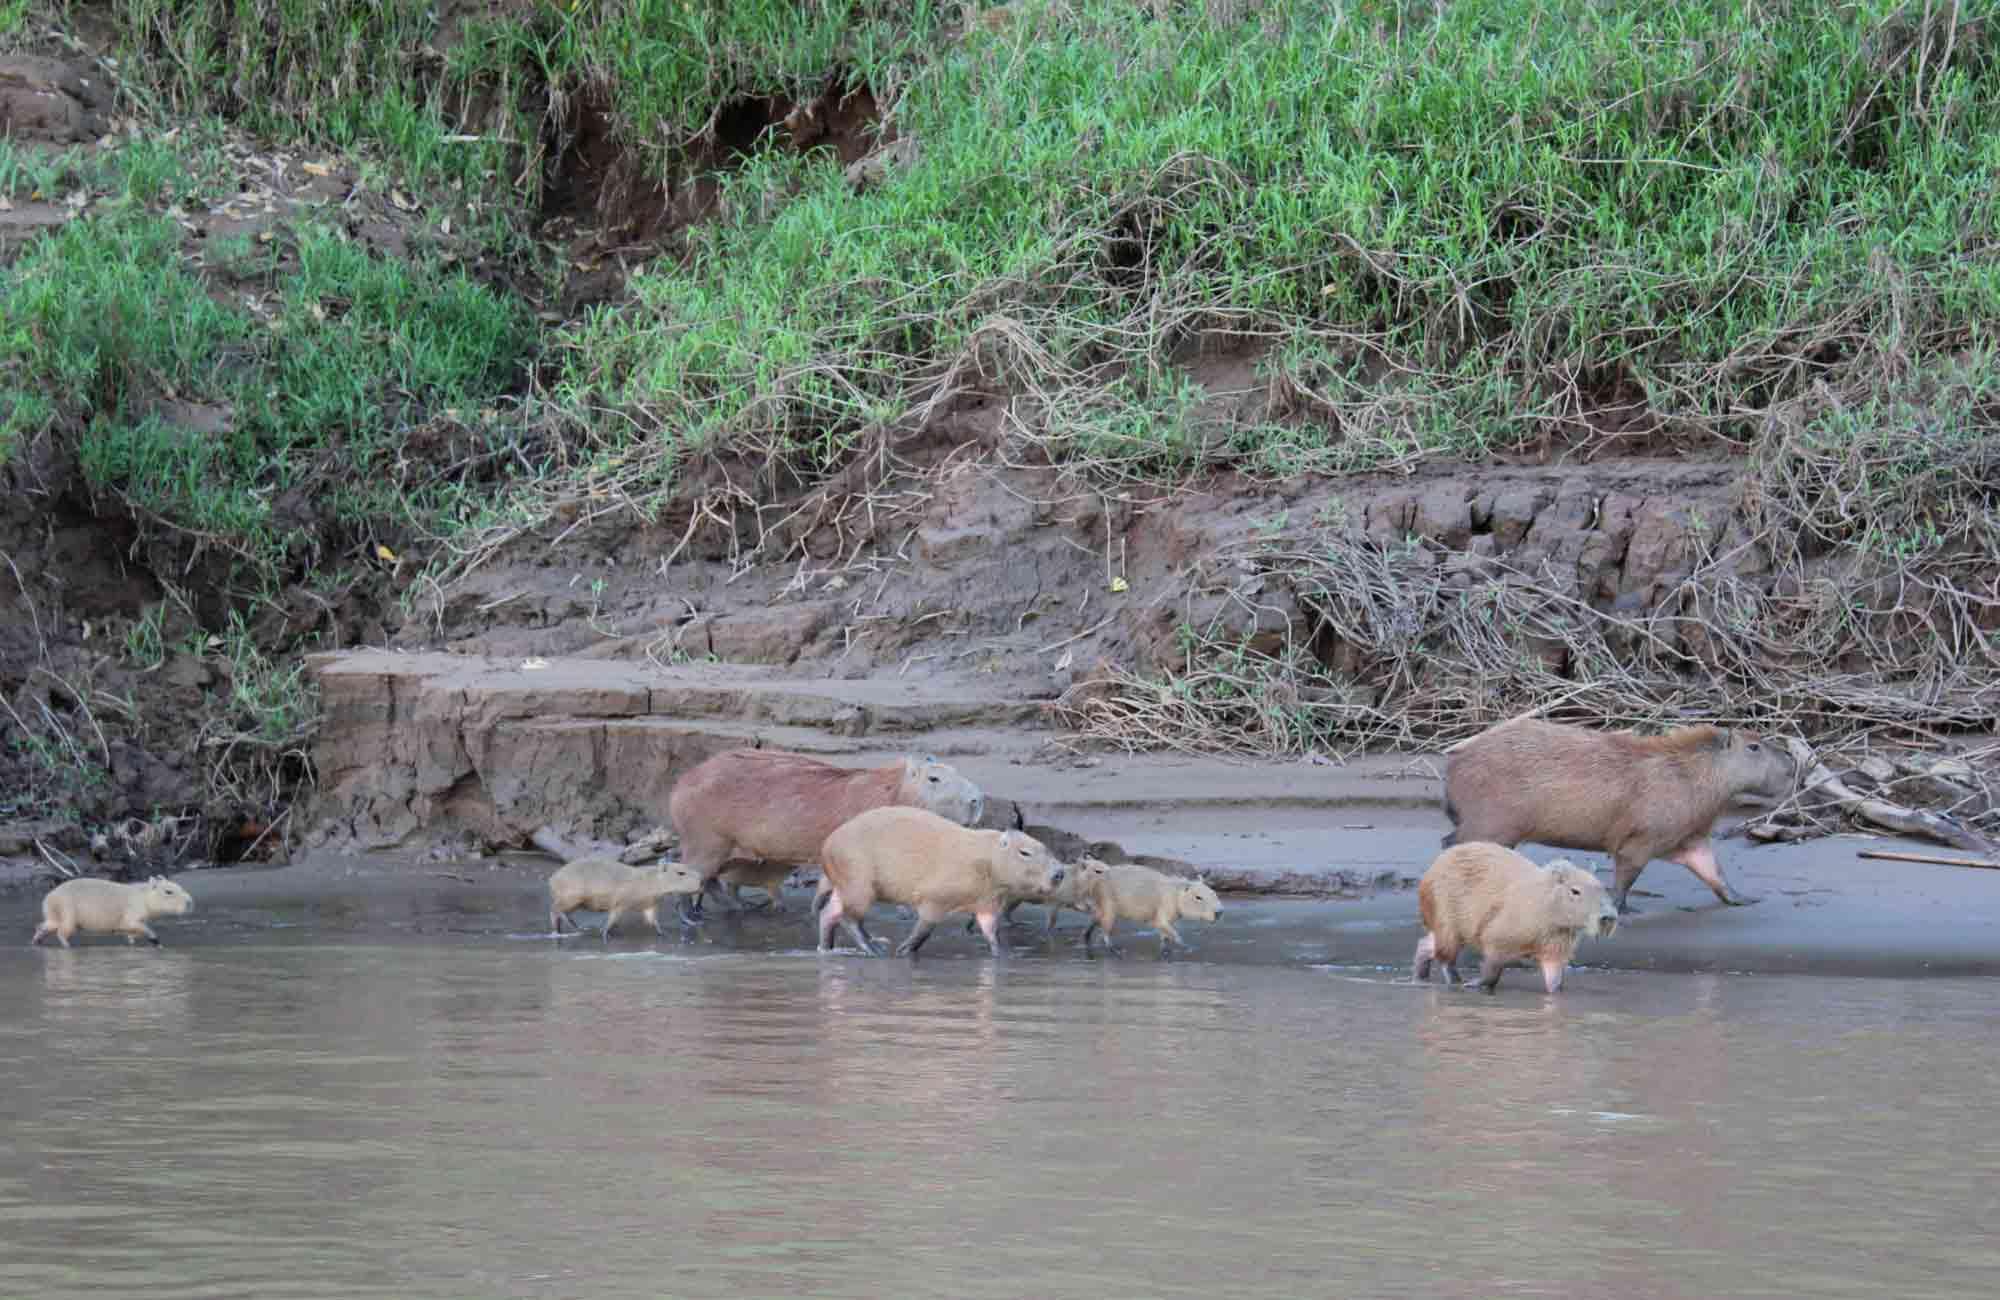 Voyage Pérou - Amazonie capibaras - Amplitudes